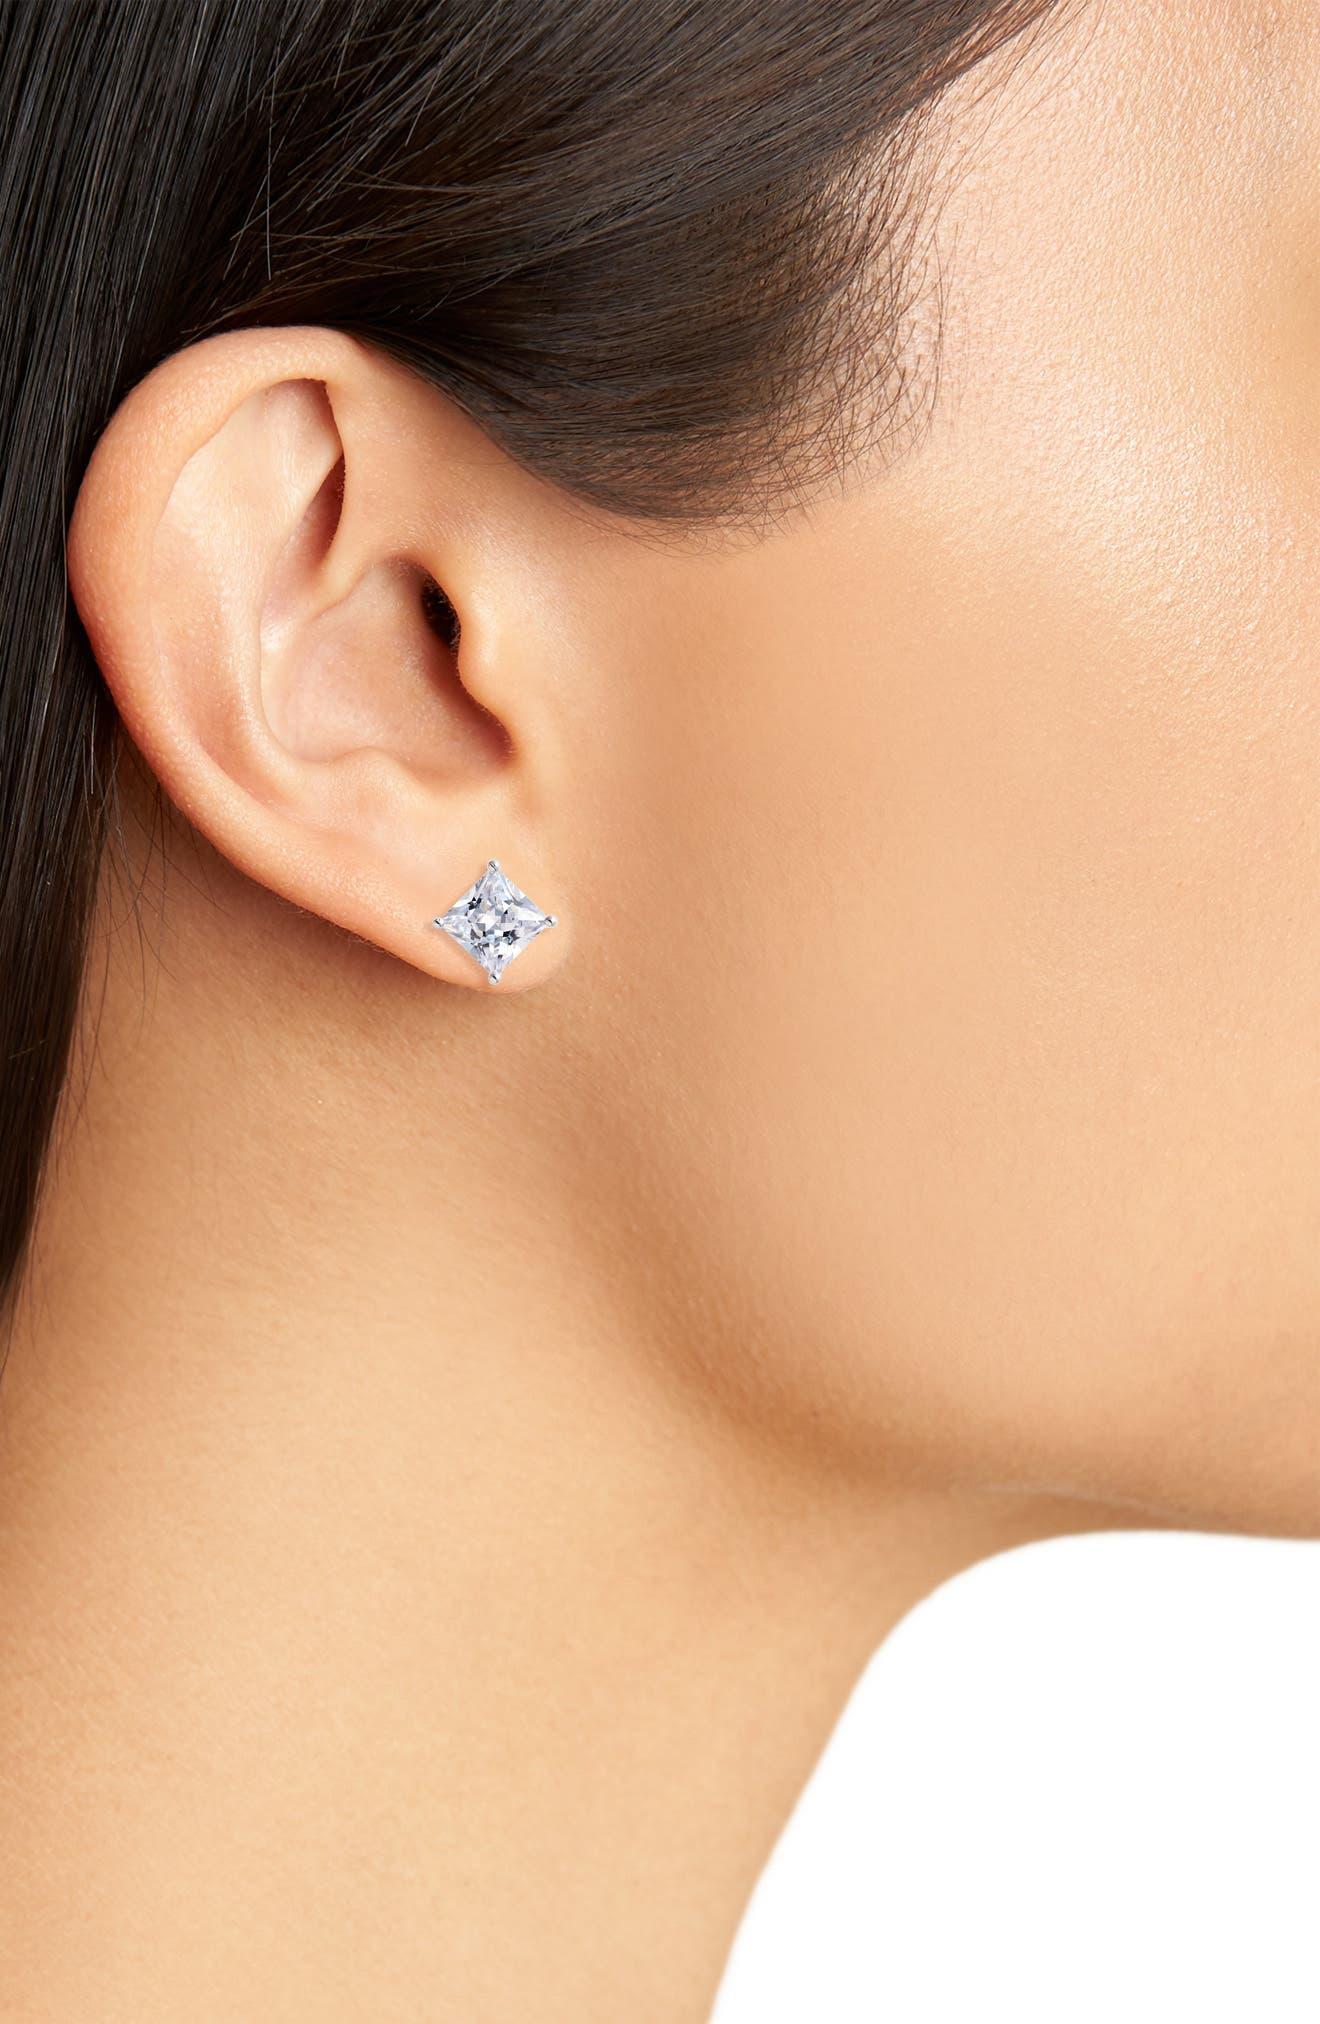 6ct tw Princess Cut Cubic Zirconia Stud Earrings,                             Alternate thumbnail 2, color,                             Platinum